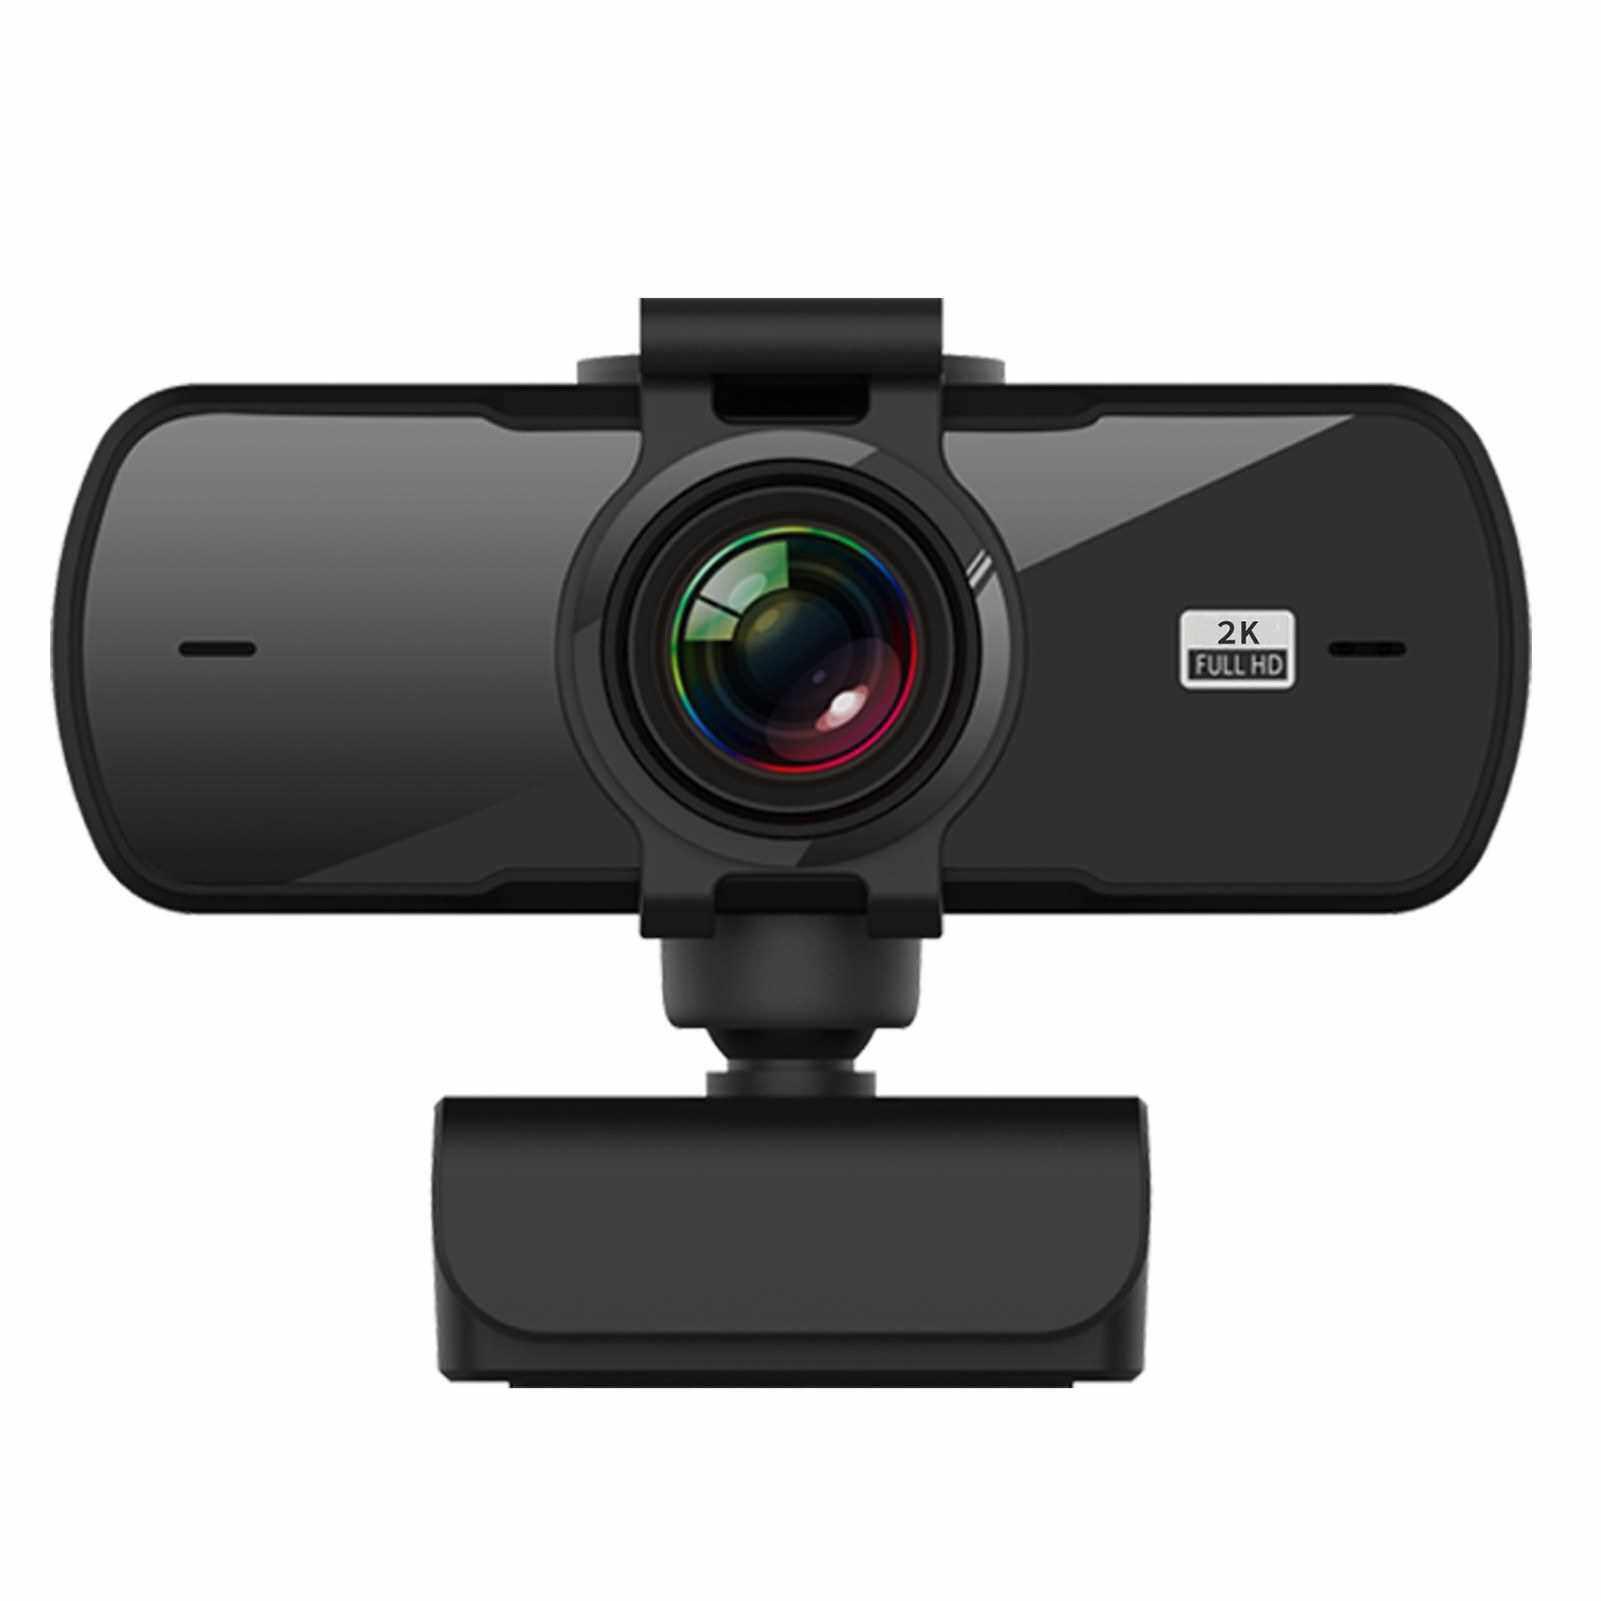 P5 USB Webcam 2K High-definition Computer Camera Conference Cam with Microphone Driver Free Video Webcam Clip-on Camera for Laptop Desktop Computer (Standard)